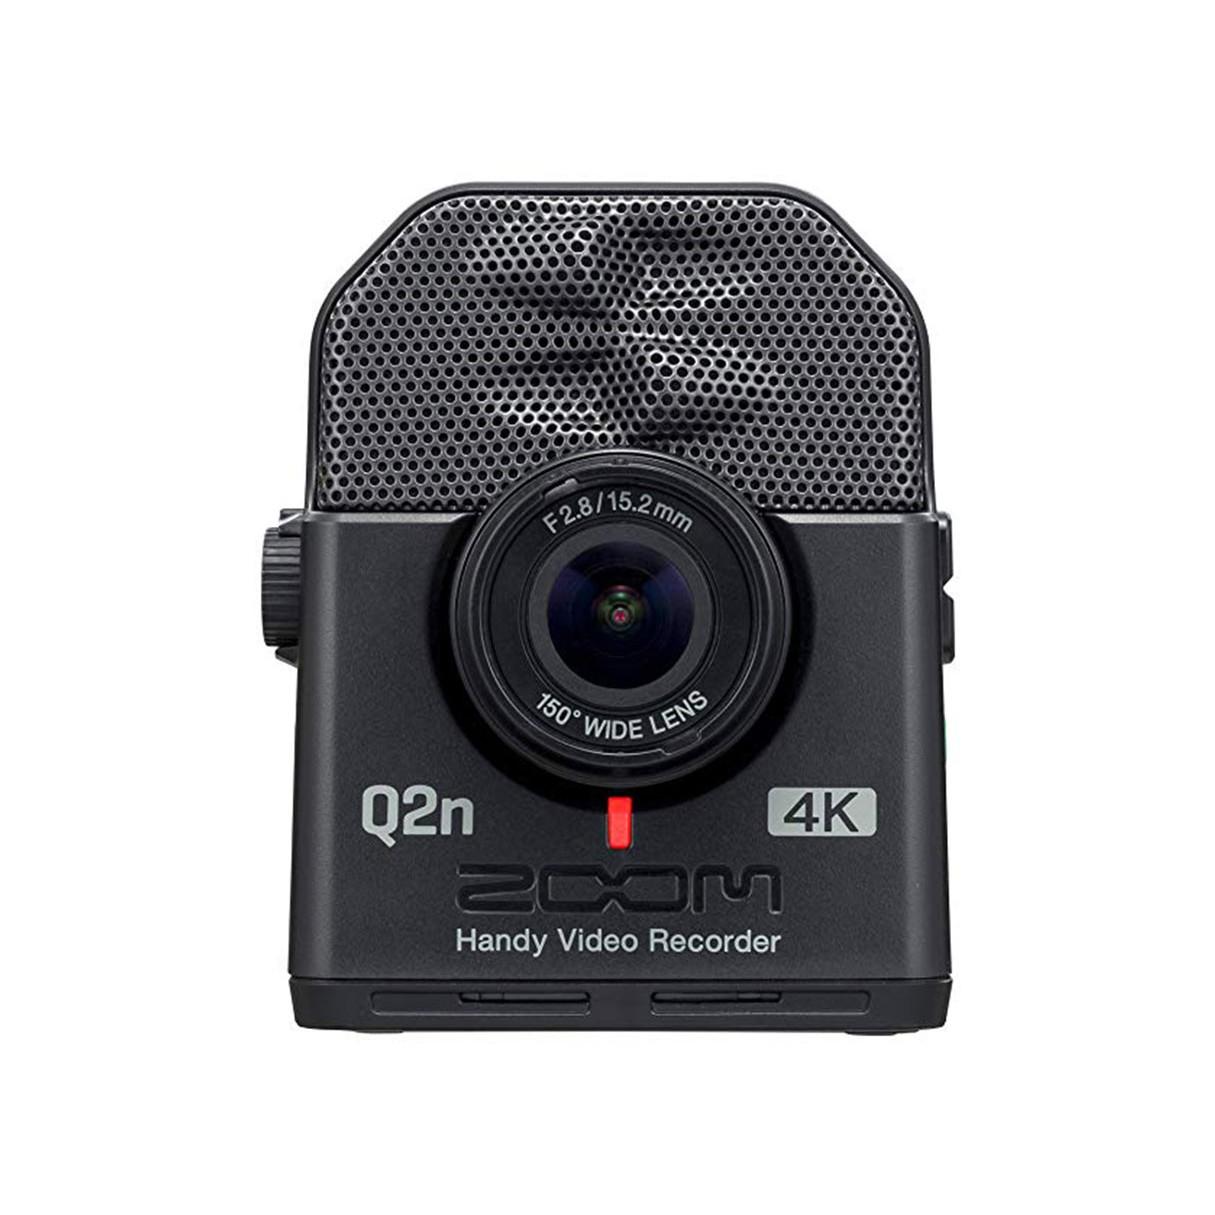 Zoom Q2n-4K Ultra High Definition Handy Video Recorder